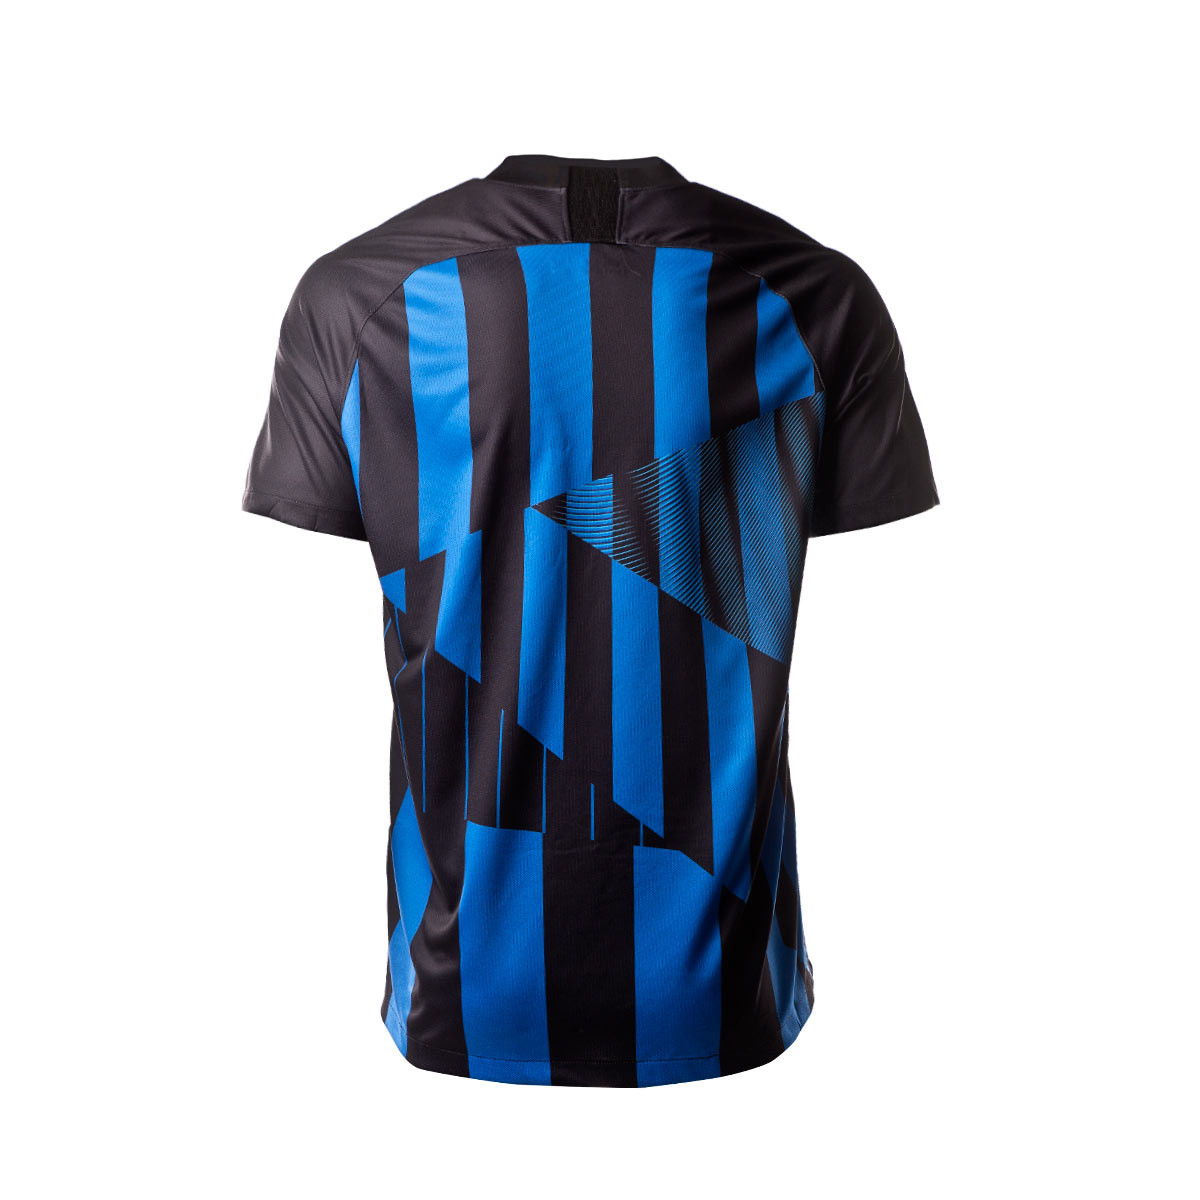 a376f8d37d1 Playera Nike Inter Milan Stadium 20th Aniversario 2018-2019 Black-Royal  blue-White - Tienda de fútbol Fútbol Emotion